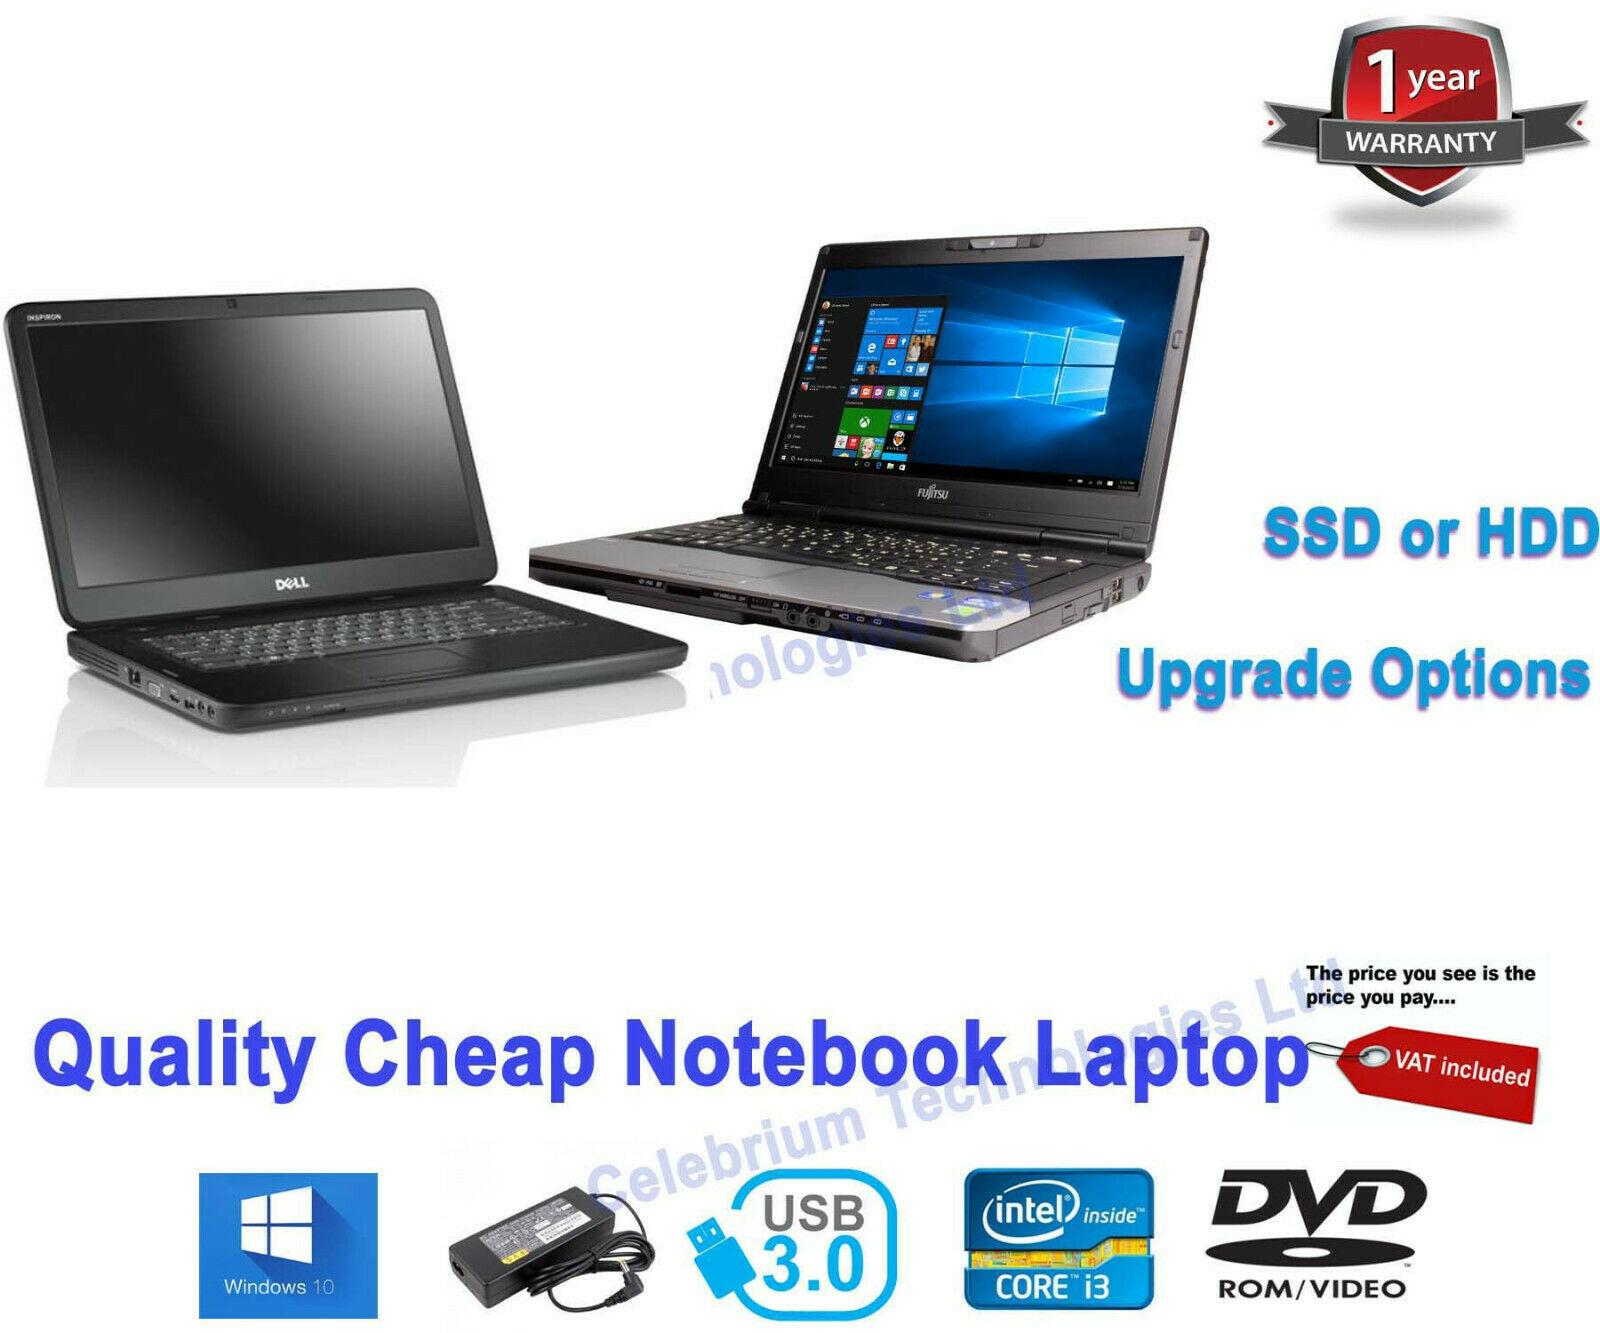 Laptop Windows - Cheap Windows 10 STUDENT LAPTOP dual Core i5 i3 2.50GHz 4GB 500GB HDD 200GB SSD